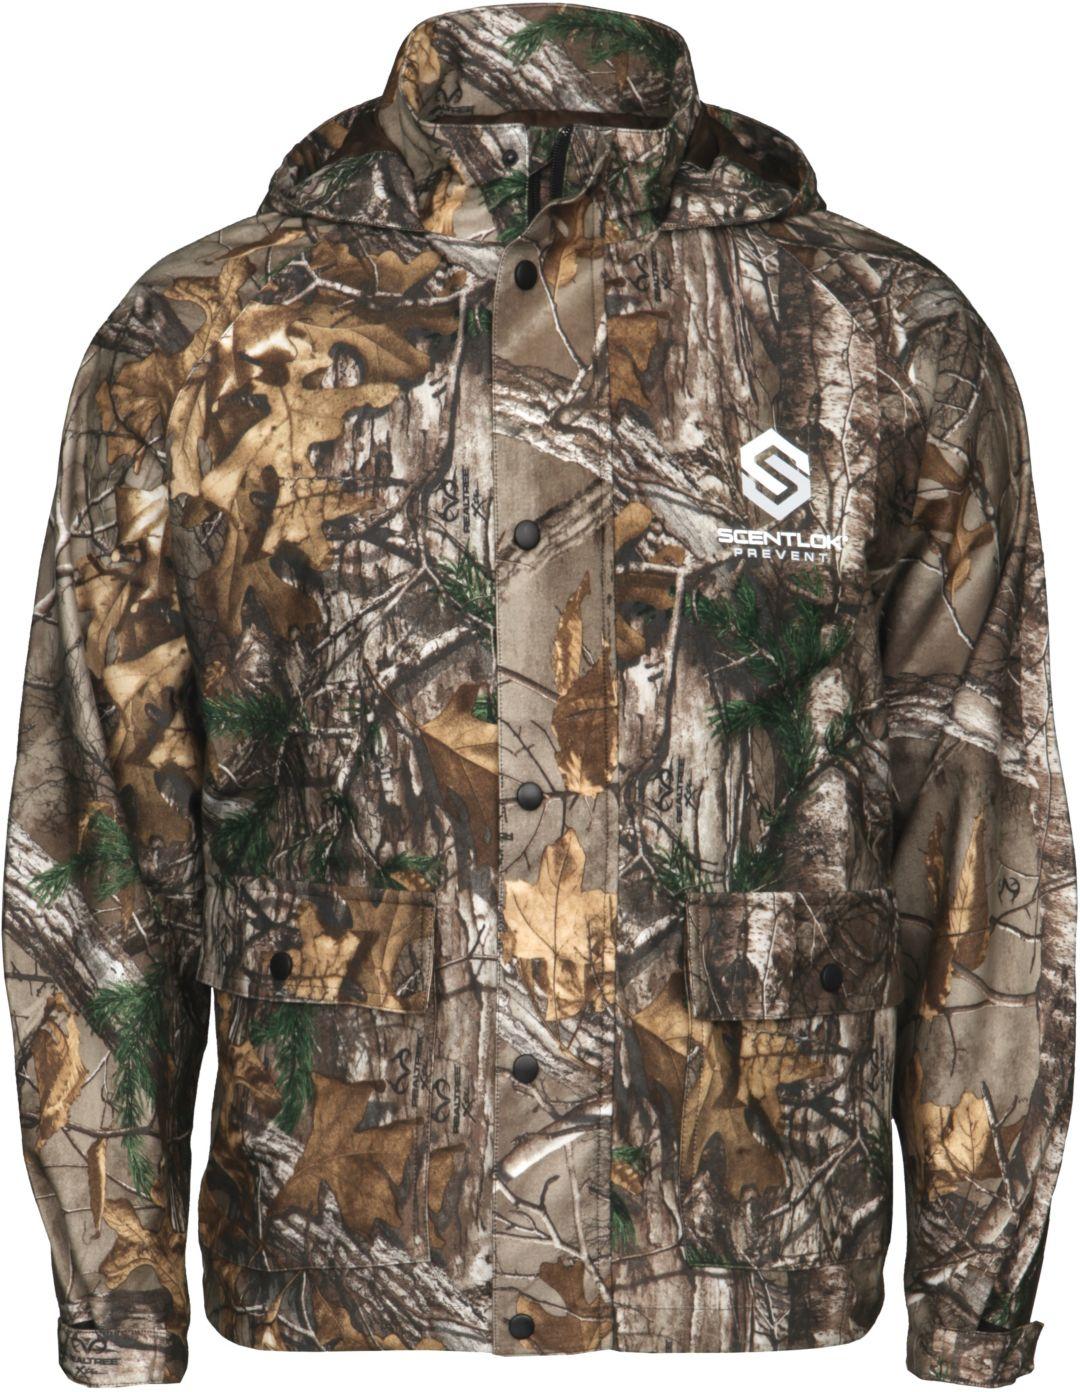 3f7a40522b937 ScentLok Men's Prevent Waterproof Hunting Jacket | DICK'S Sporting Goods